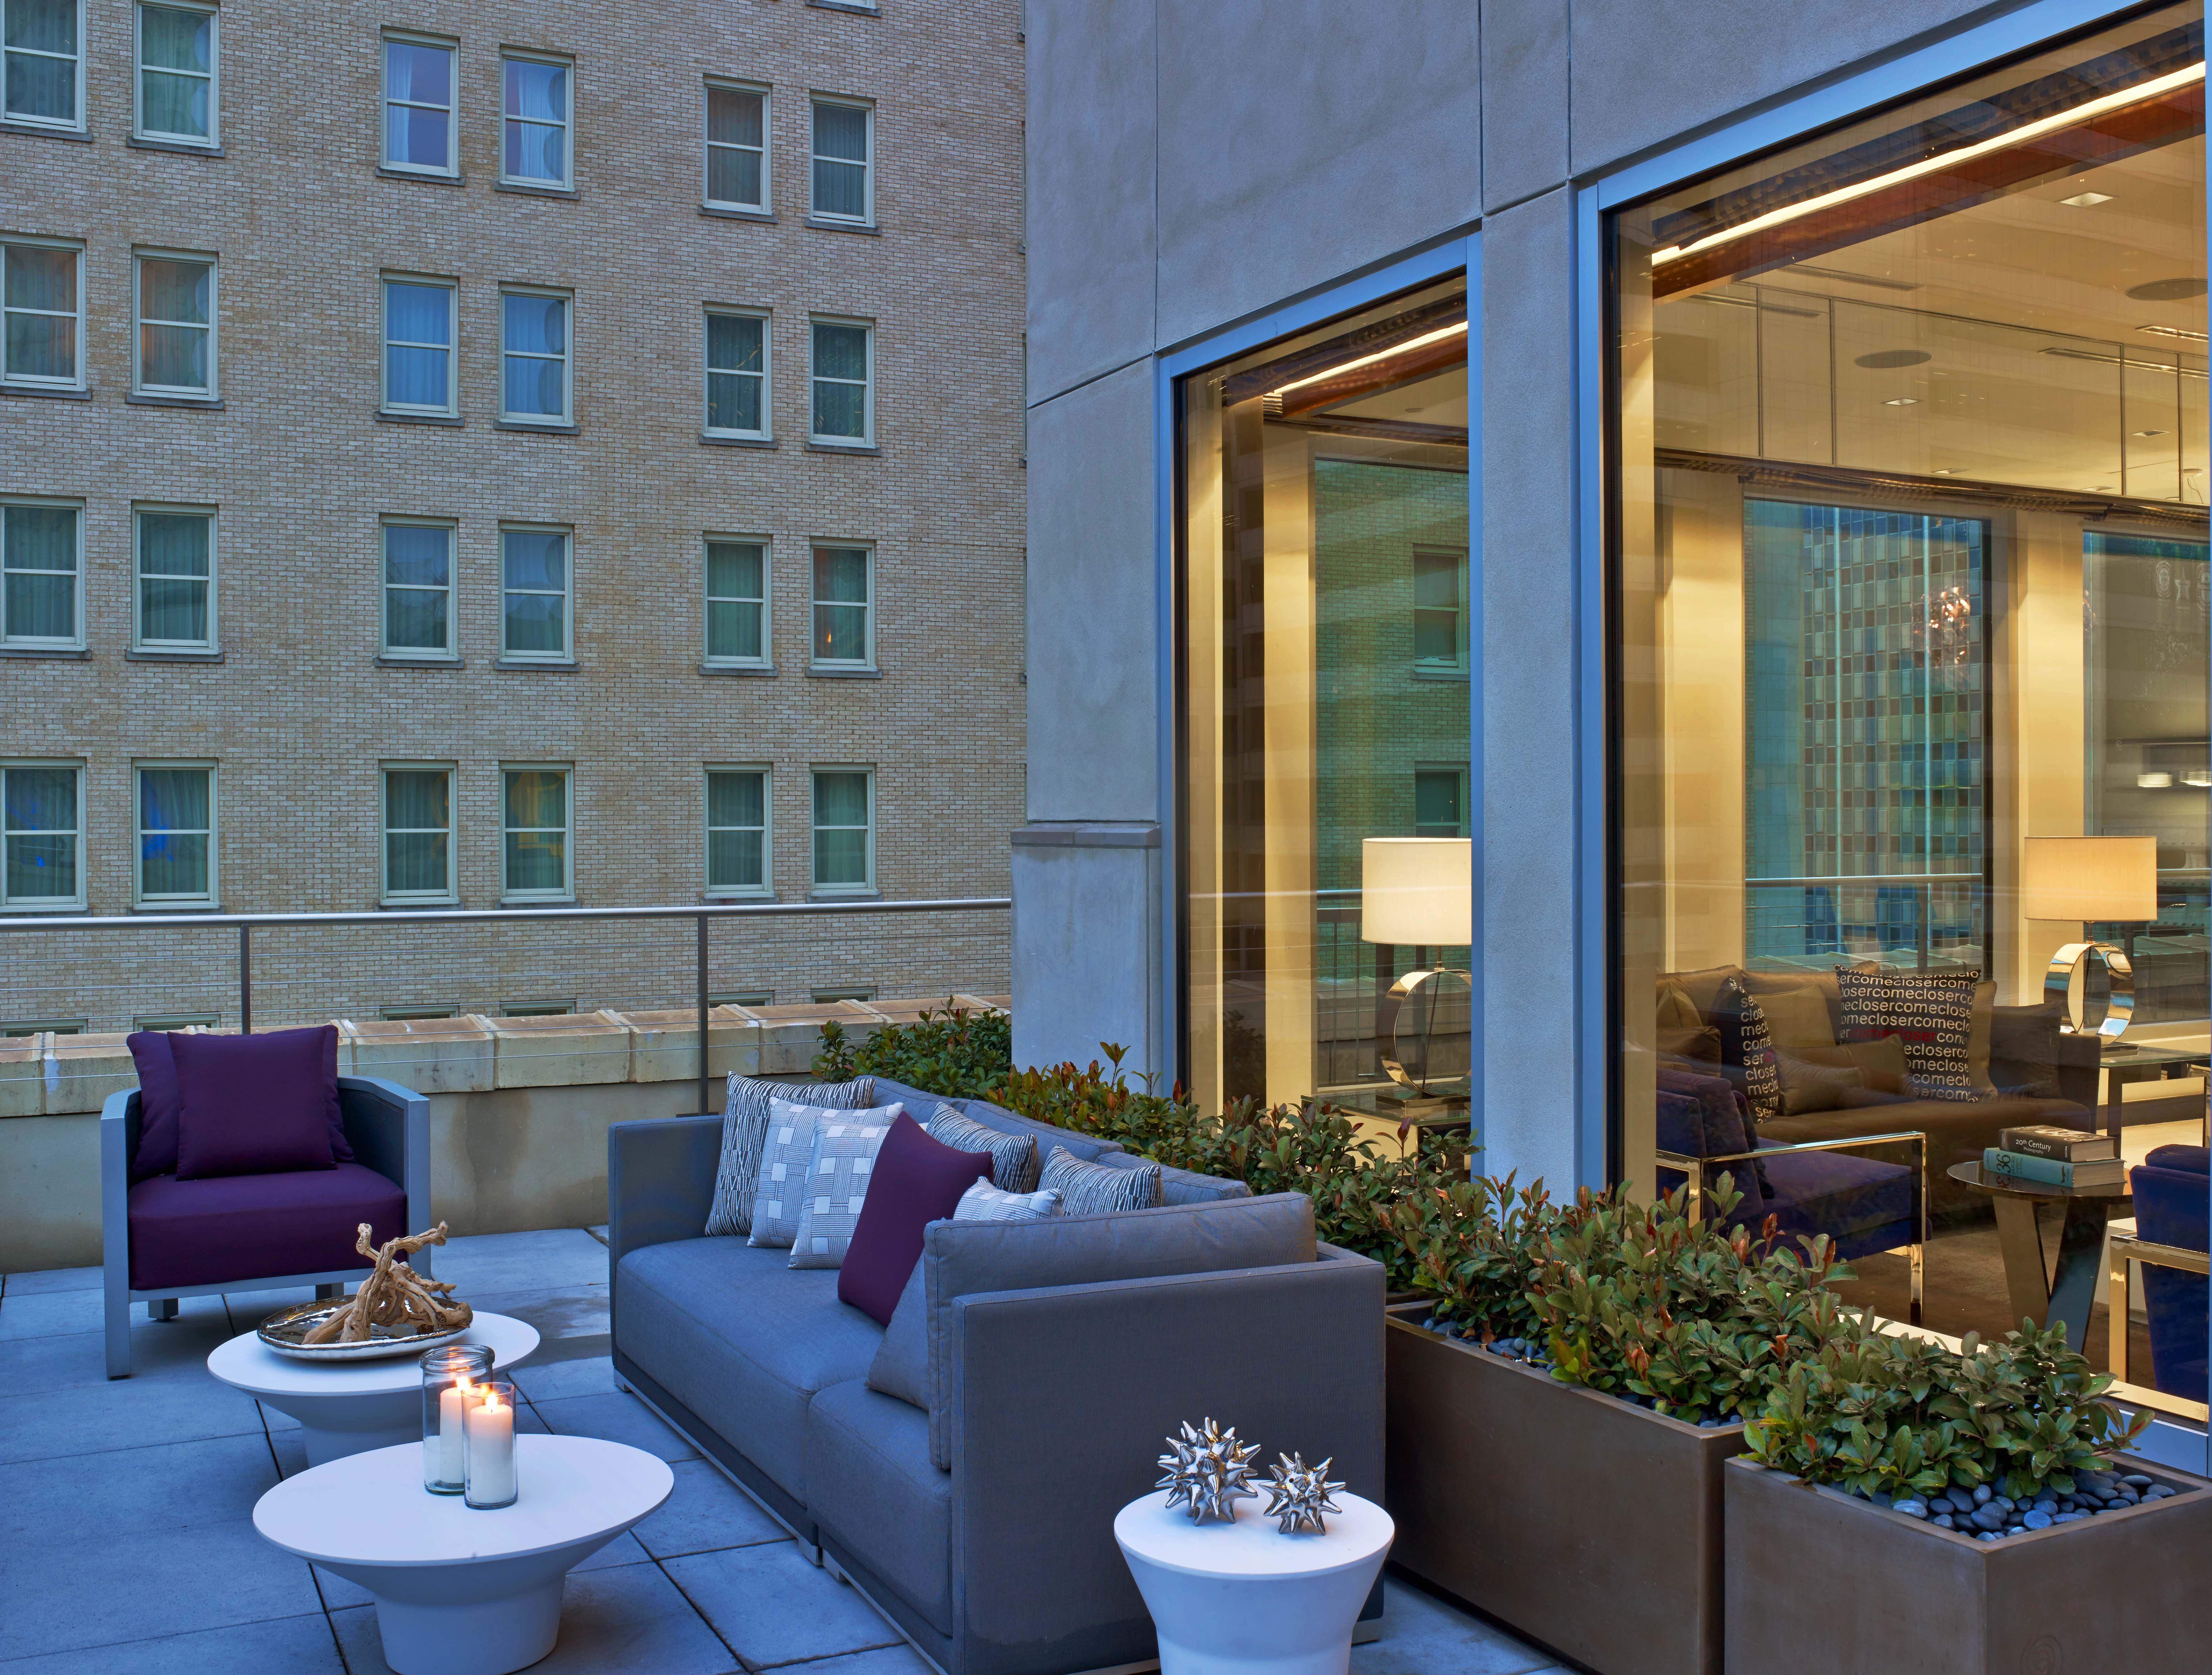 Penthouse Terrace at The Joule | The Joule | Pinterest ...